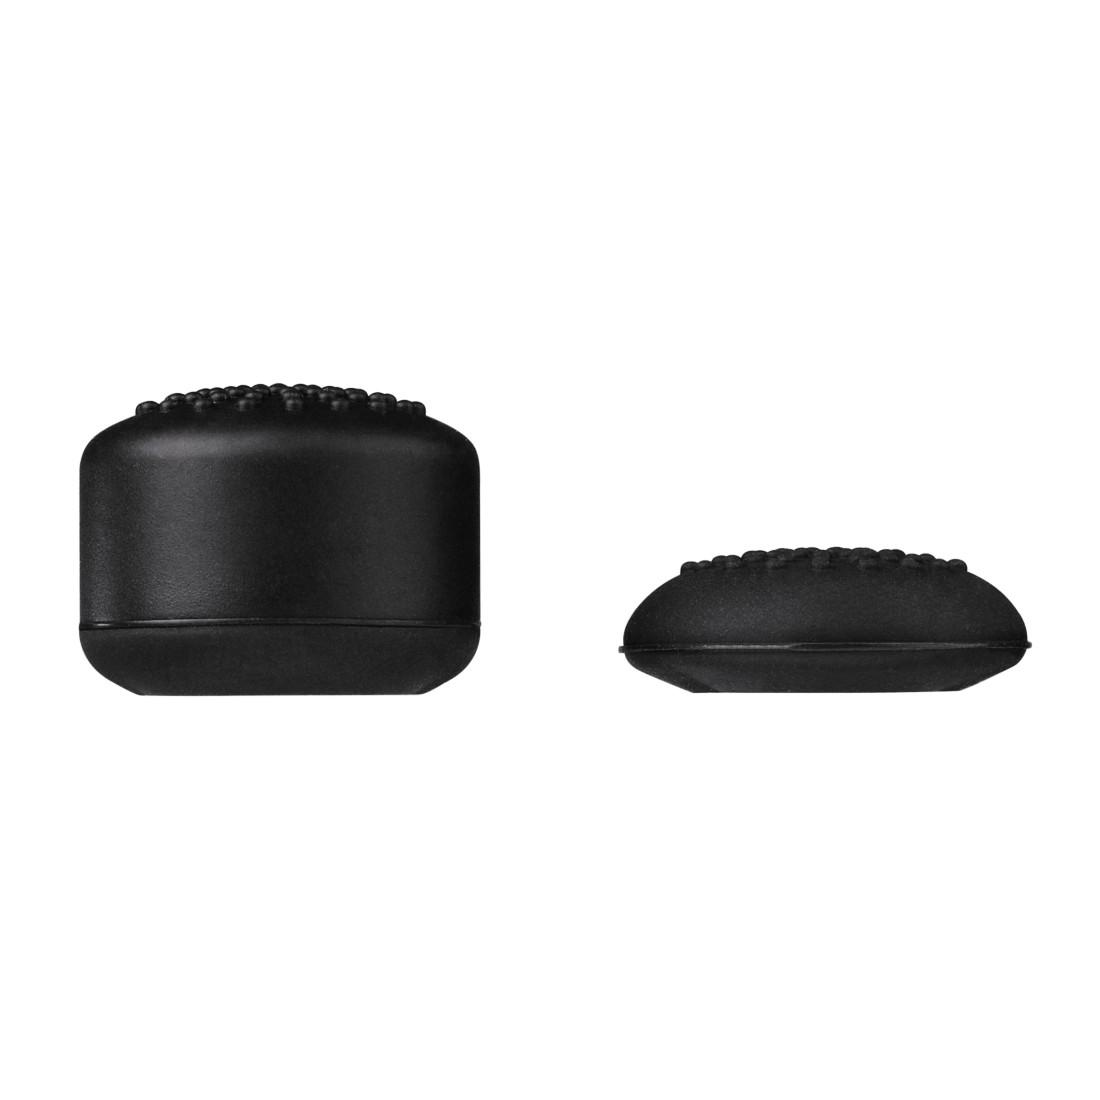 Сменяеми бутончета HAMA 115406 за SONY PS4 комплект 8in1, Черен